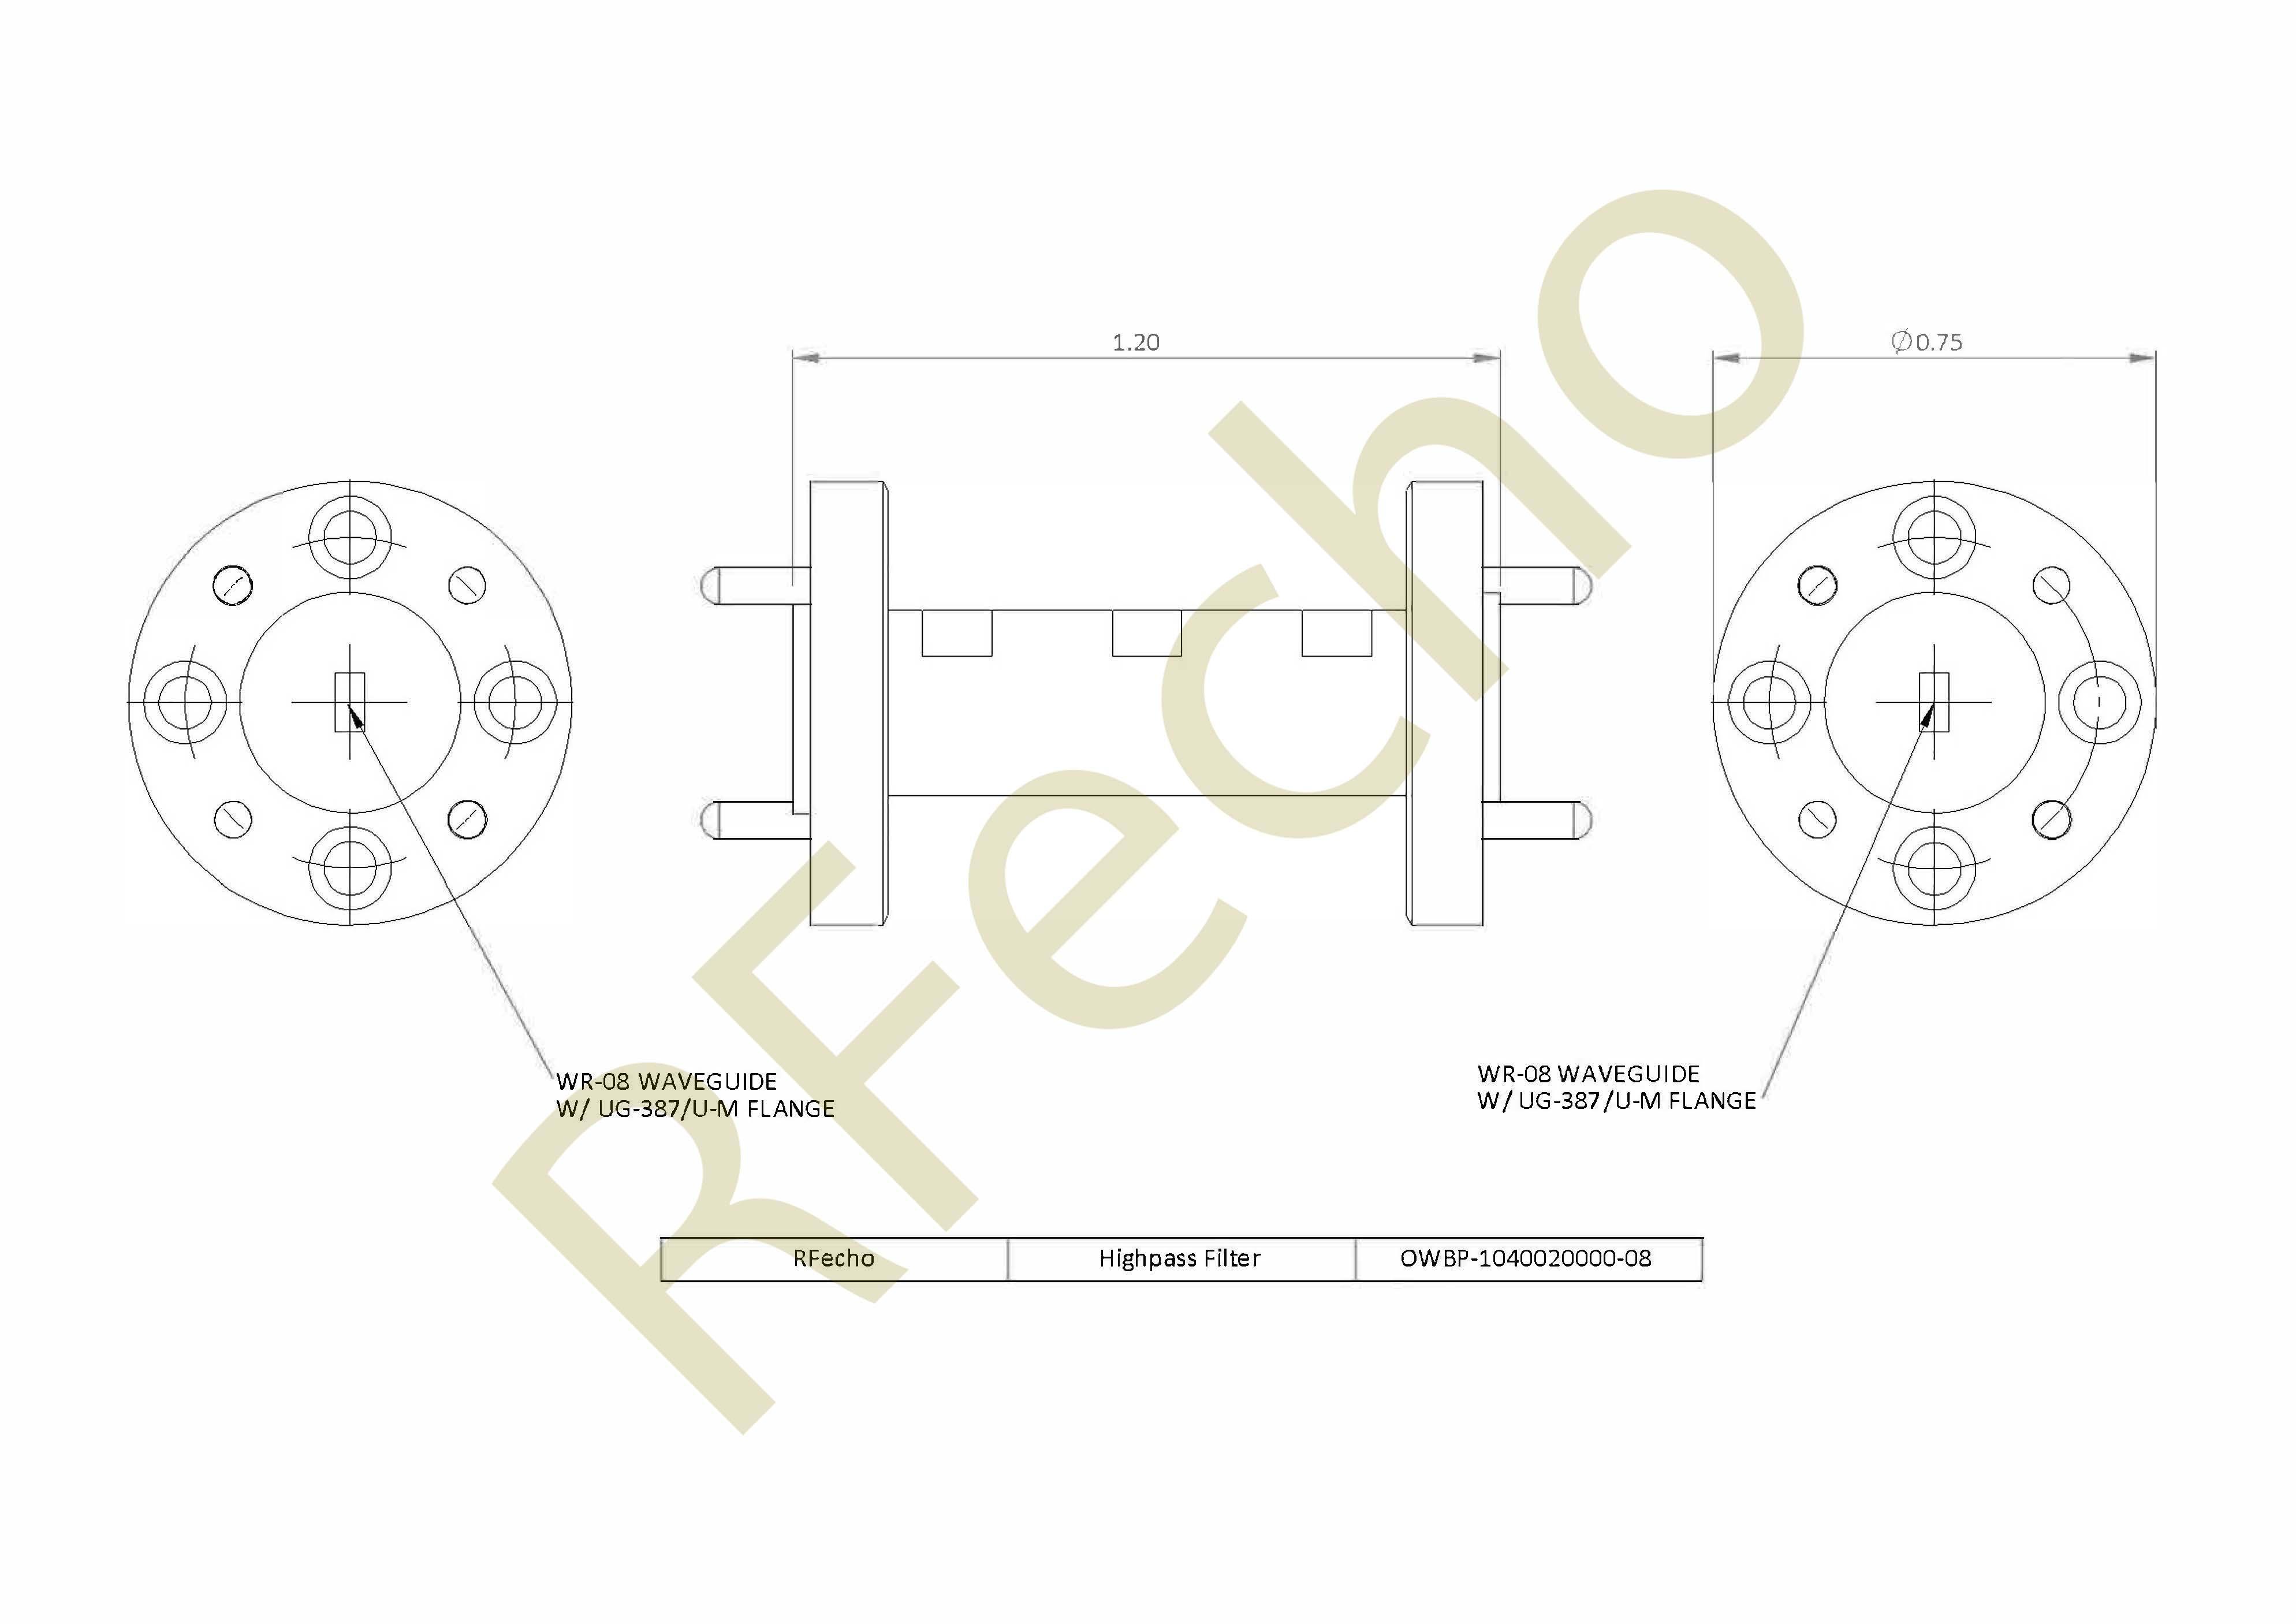 RF High Pass Filter 104GHz to 200GHz Waveguide High pass filter rejection 40dB DC-100GHz